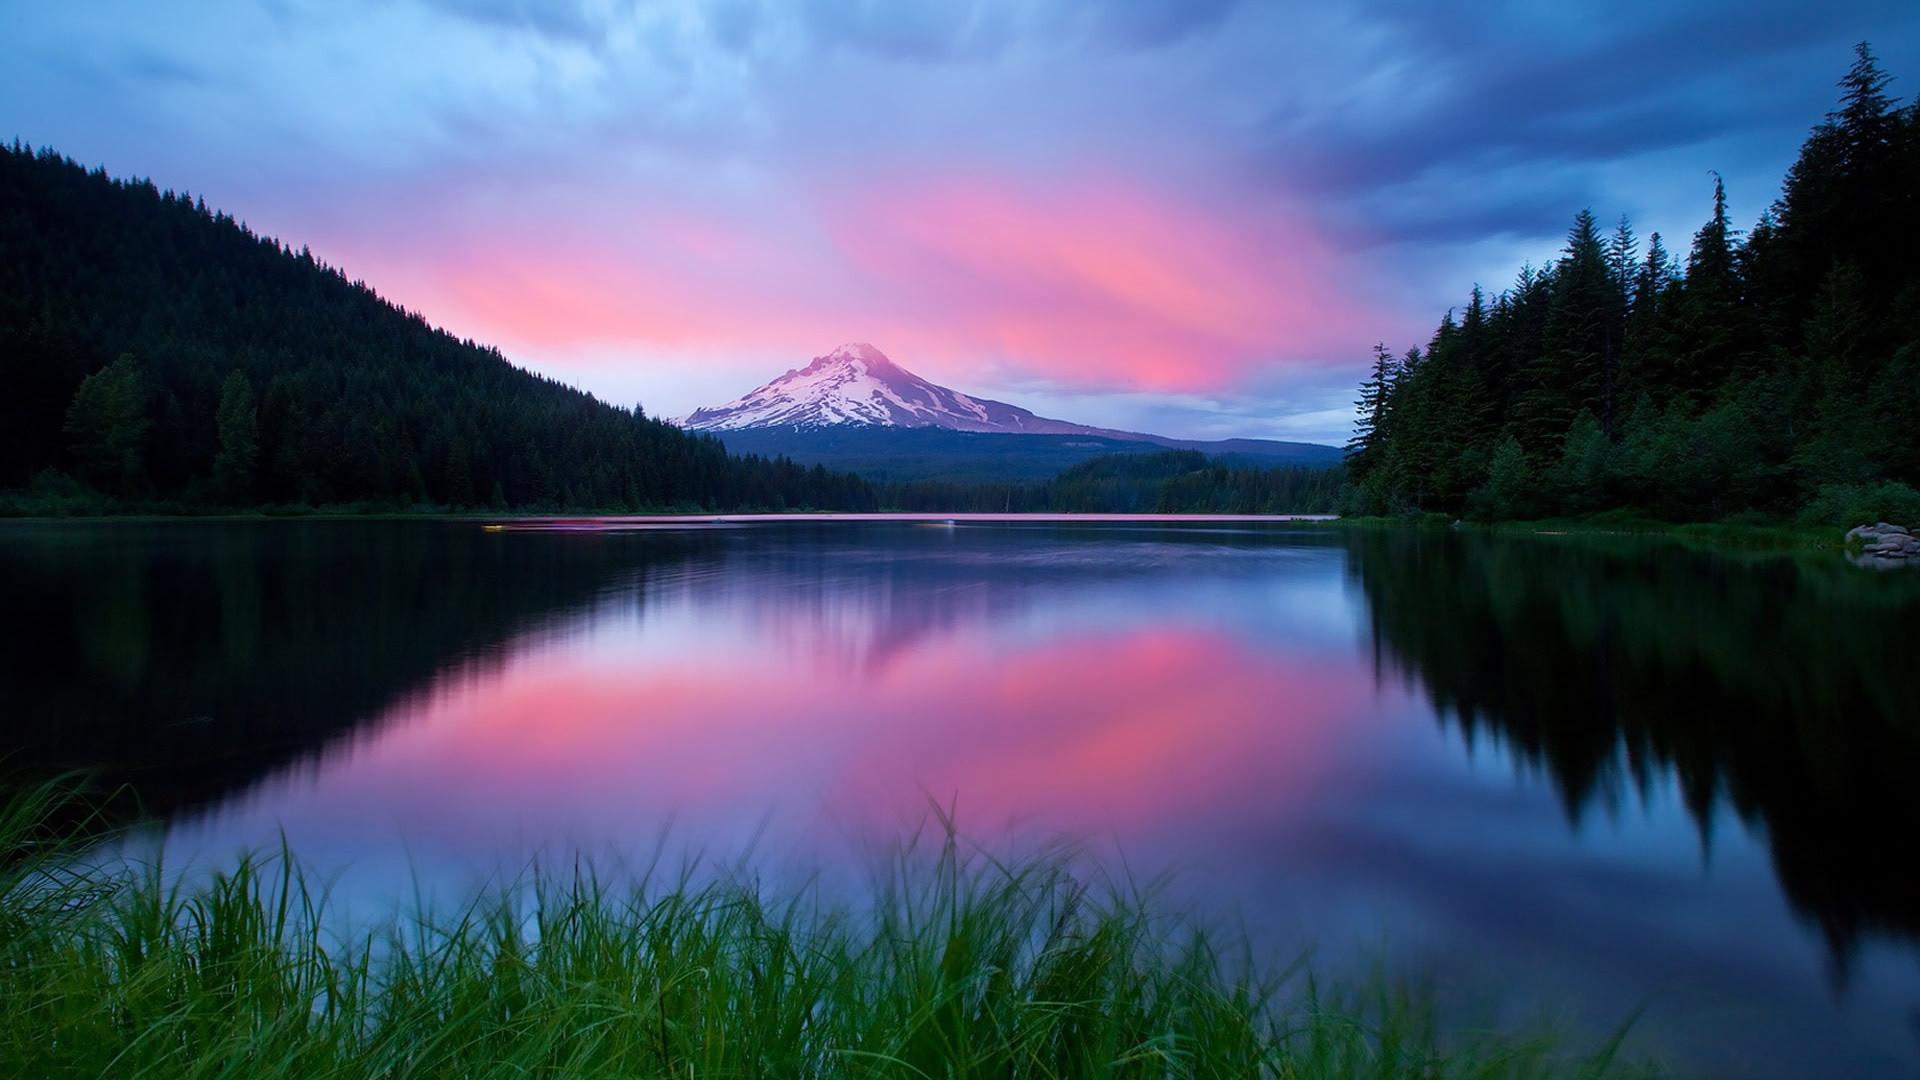 Mt. Hood, Oregon [2560×1920] HD Wallpaper From Gallsource.com | HD Nature  Photos | Pinterest | Hoods, Hd backgrounds and Nature photos